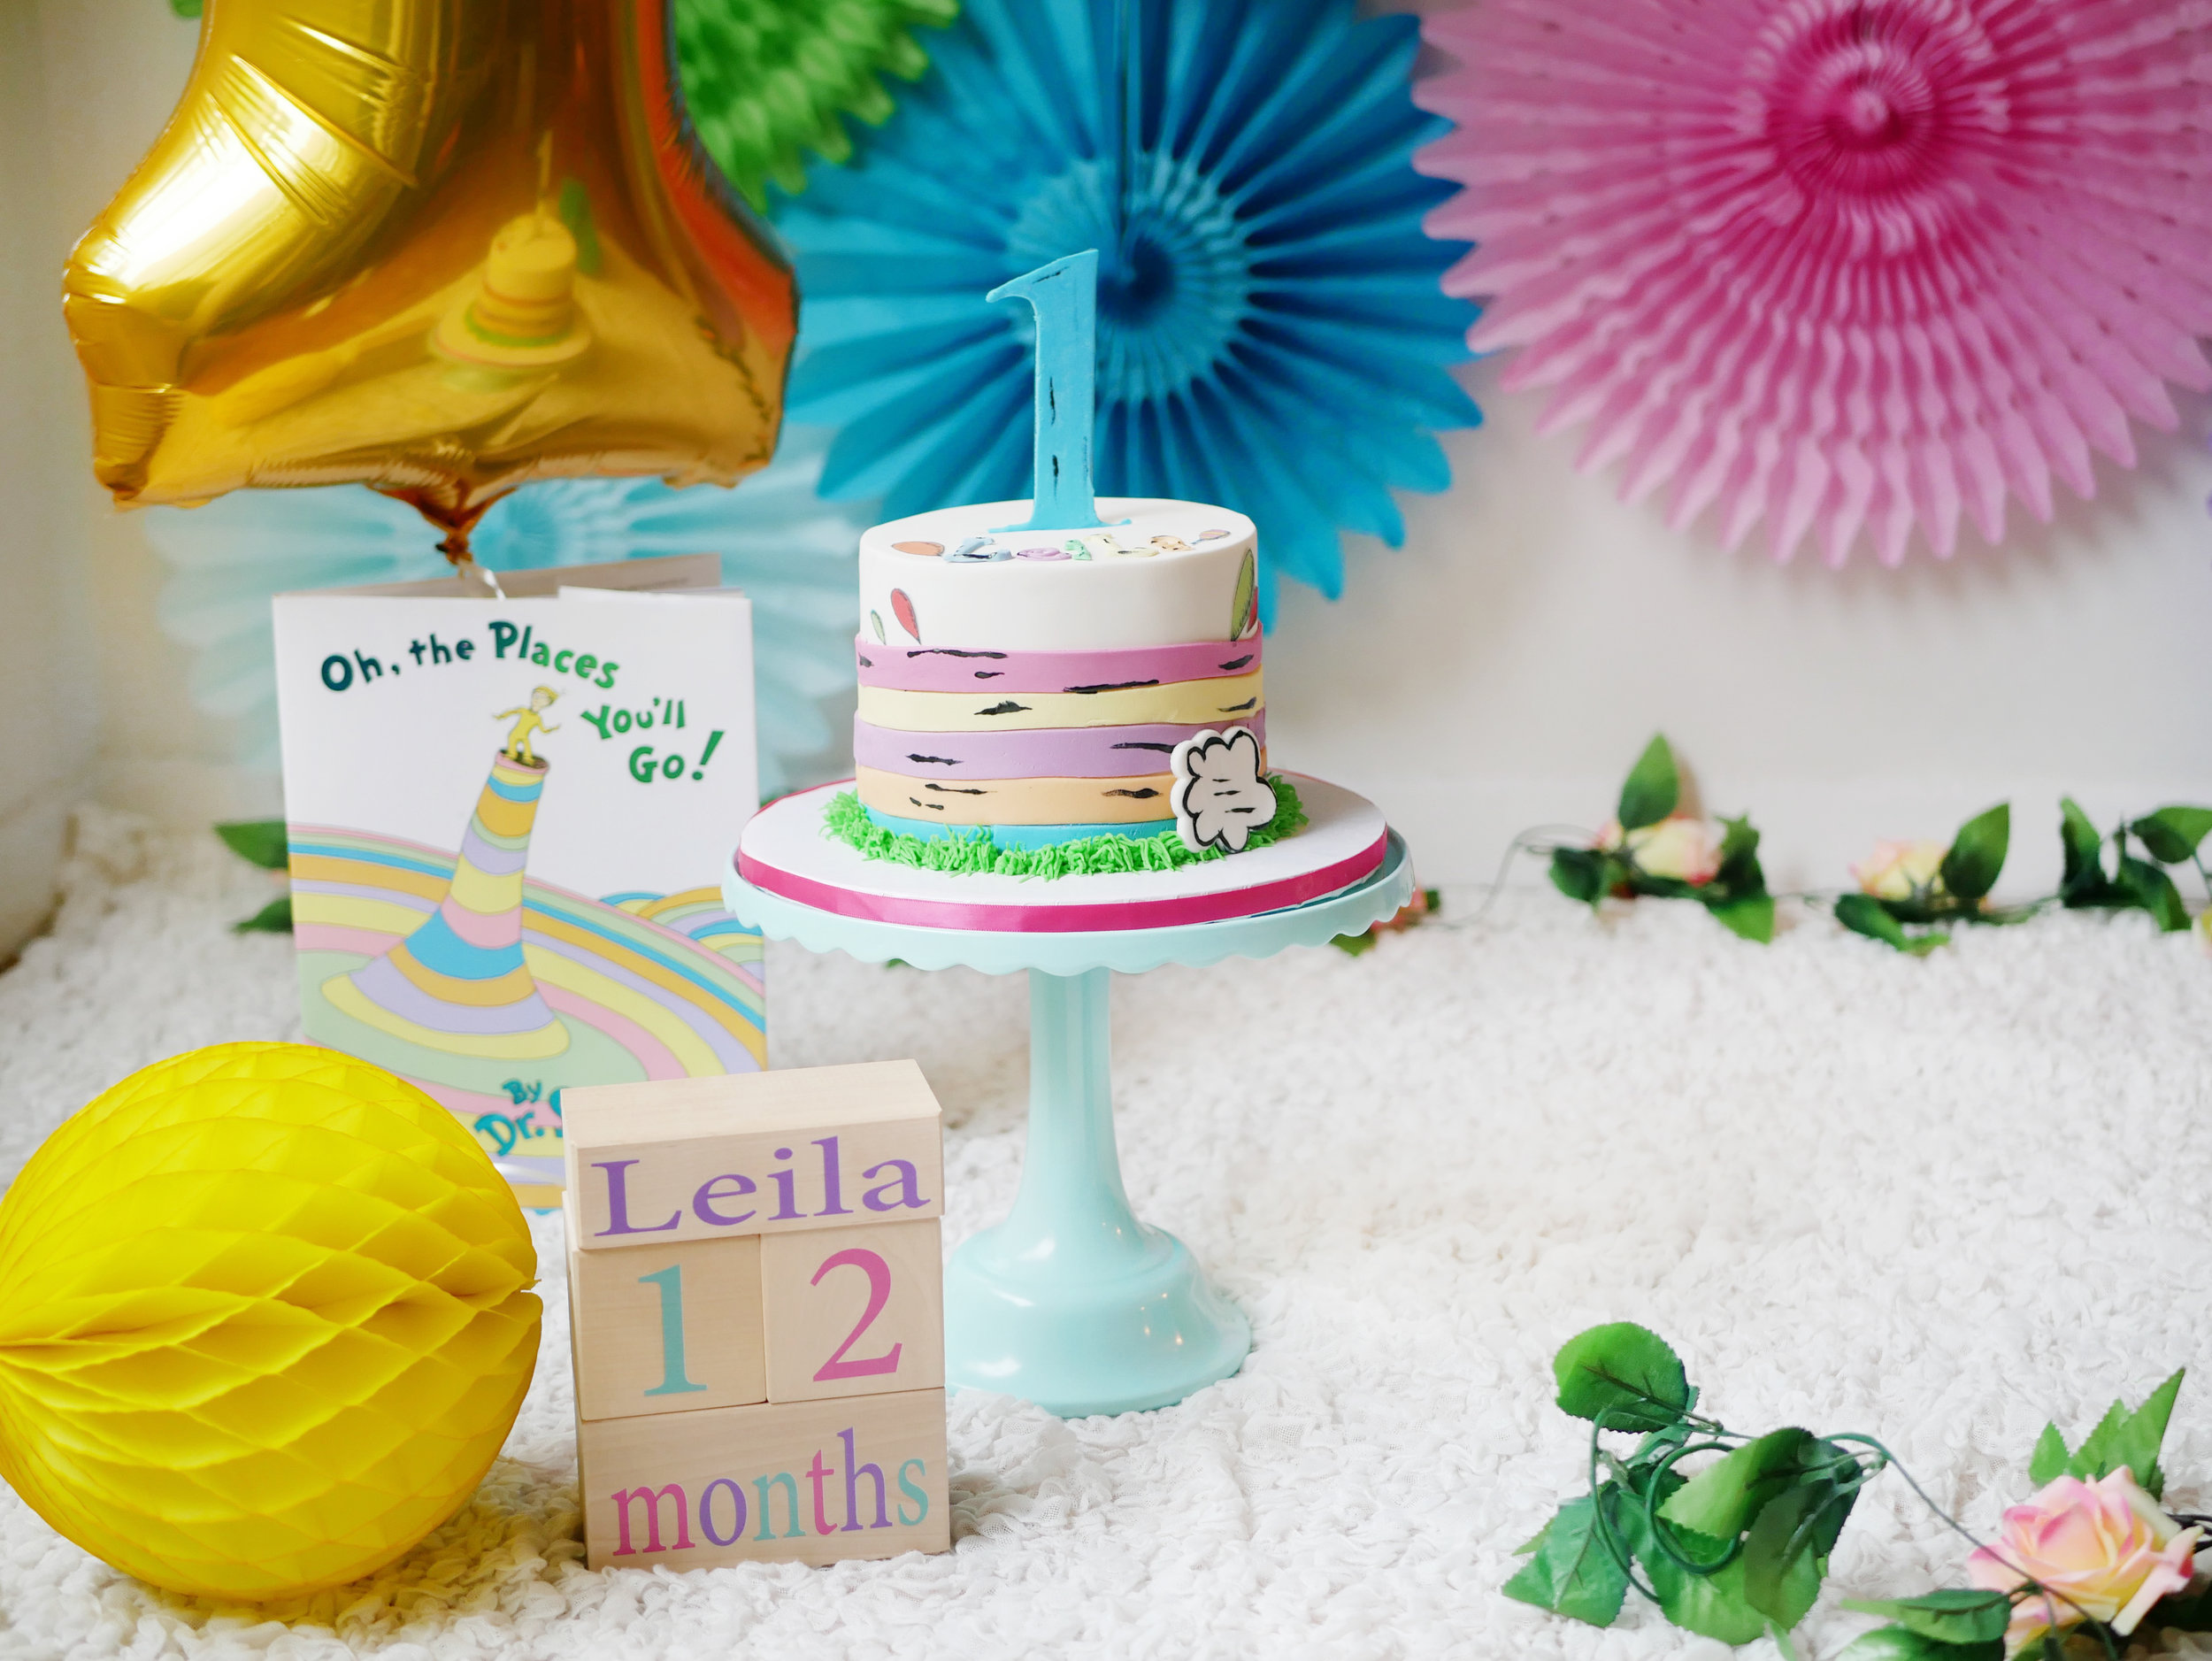 BONITO DESIGN EVENTS - LEILA CAKE SMASH 46.jpg